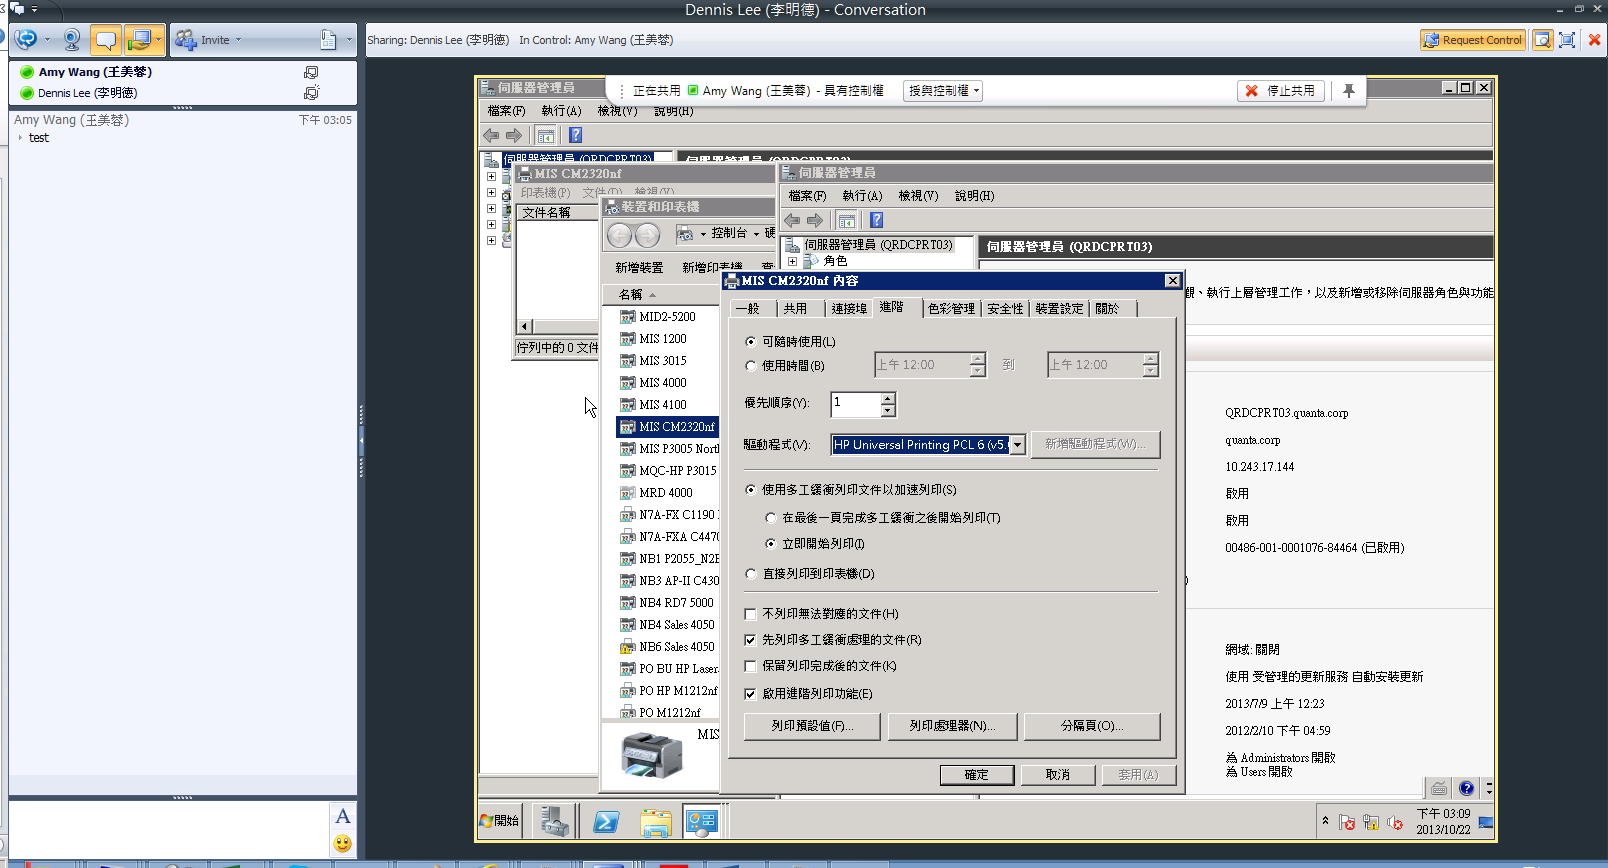 Hp Universal Print Driver Server 2008 R2